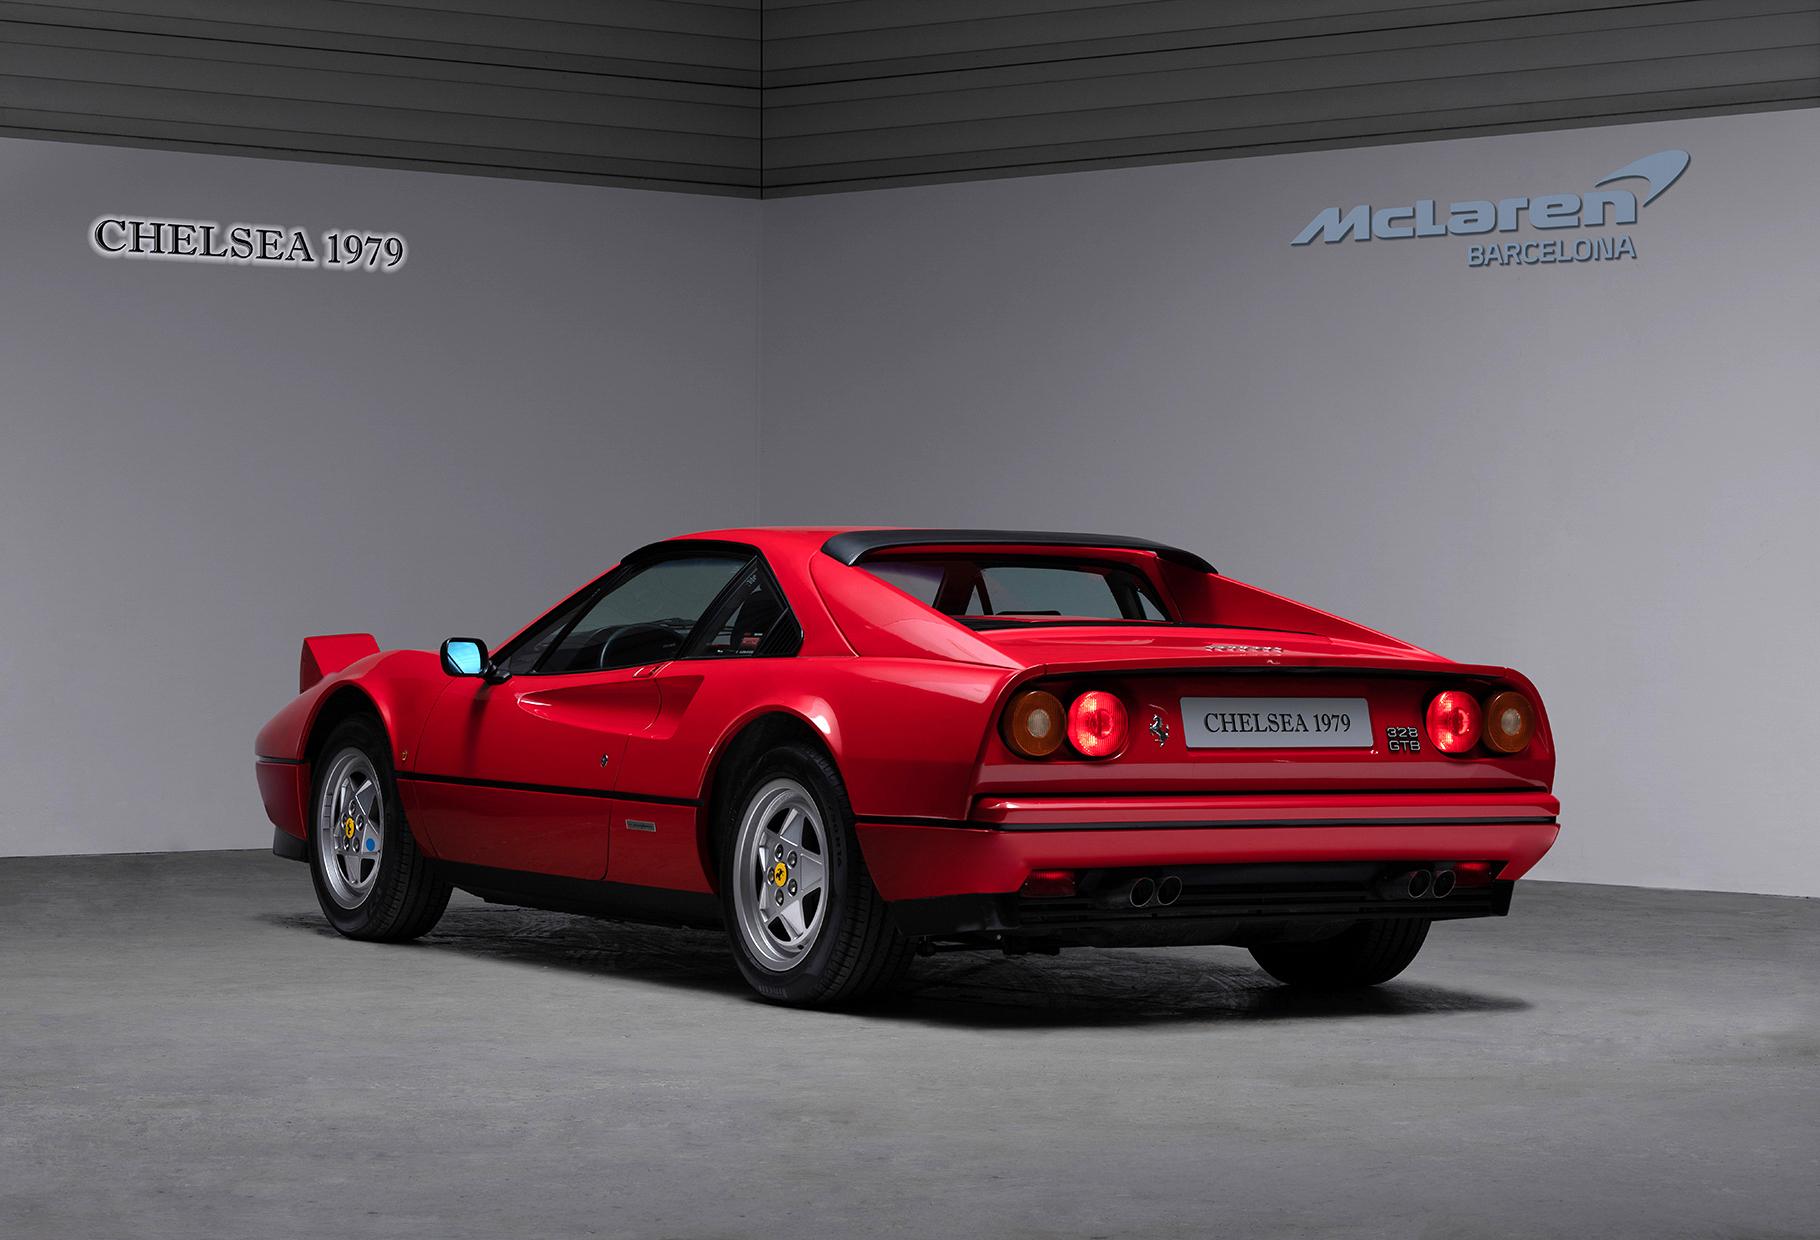 06 FERRARI GTB312 TRASERA 1 4 Ferrari GTB 312